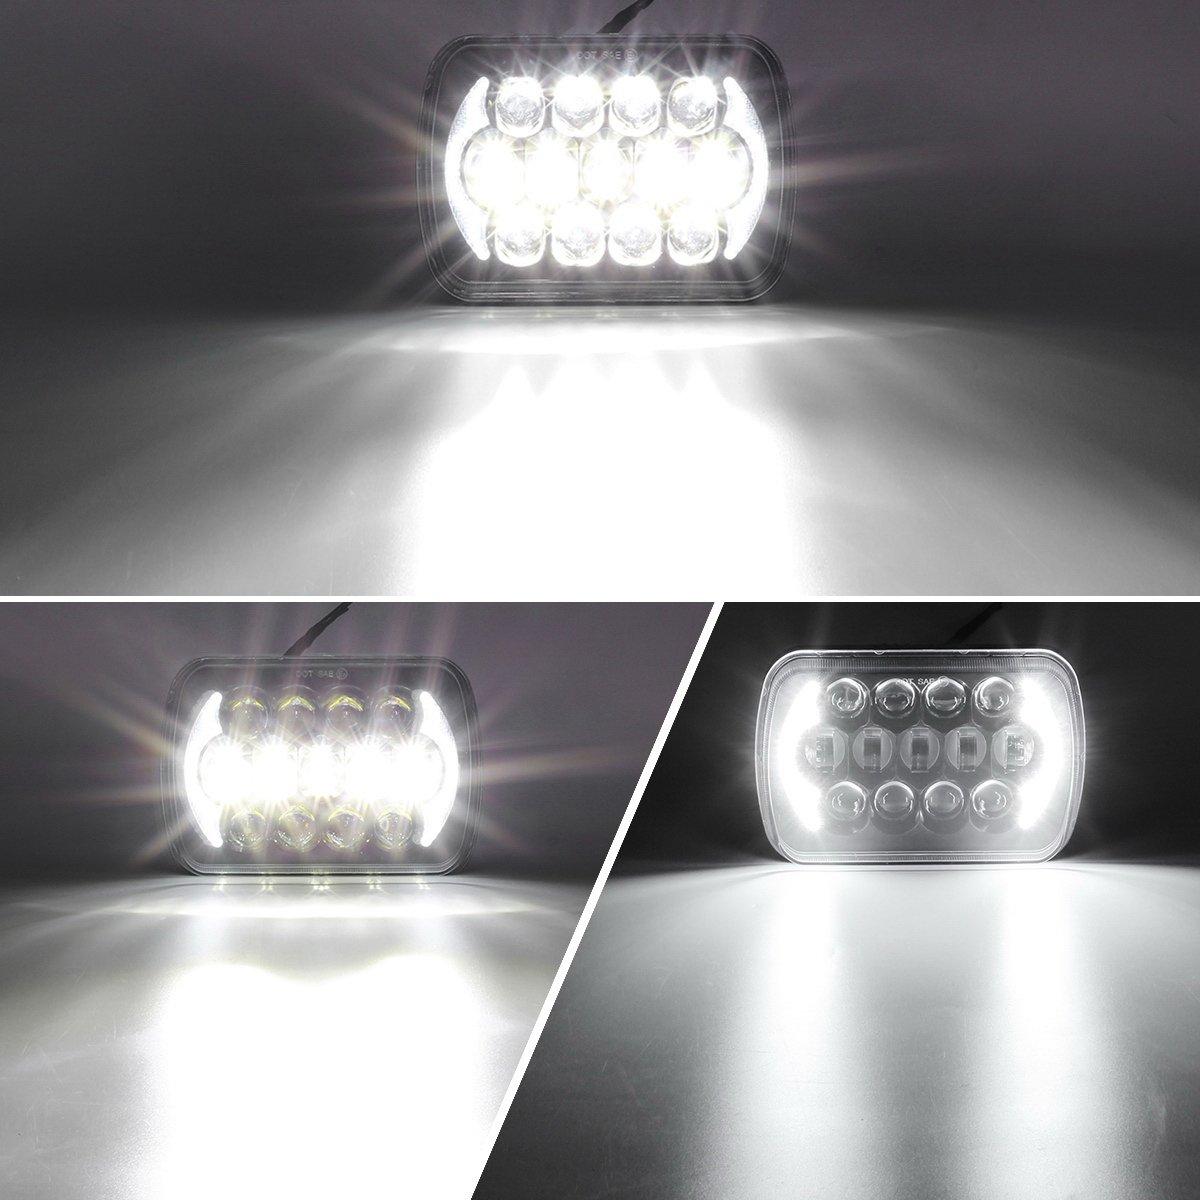 Partsam 5x7 LED Headlights 7x6 Sealed Beam Osram Chip Angel Eyes DRL Hi//Lo Replacement for C4 Corvette H6054 6054 Jeep Wrangler YJ Cherokee XJ Toyota 4Runner Tacoma Chevy Blazer Express Van 2PCS